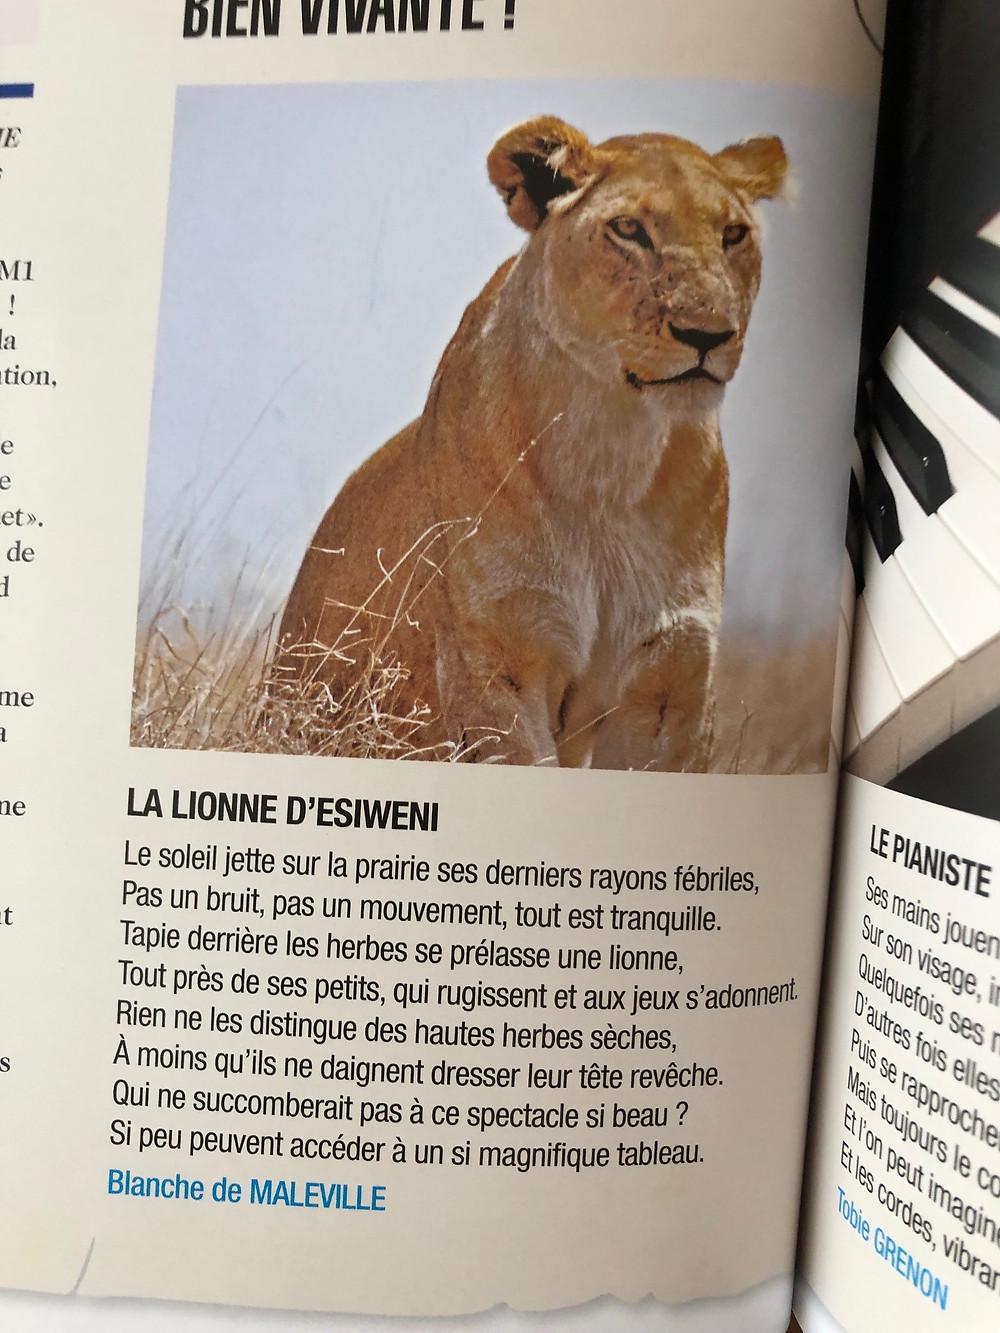 Esiweni's Lionnes